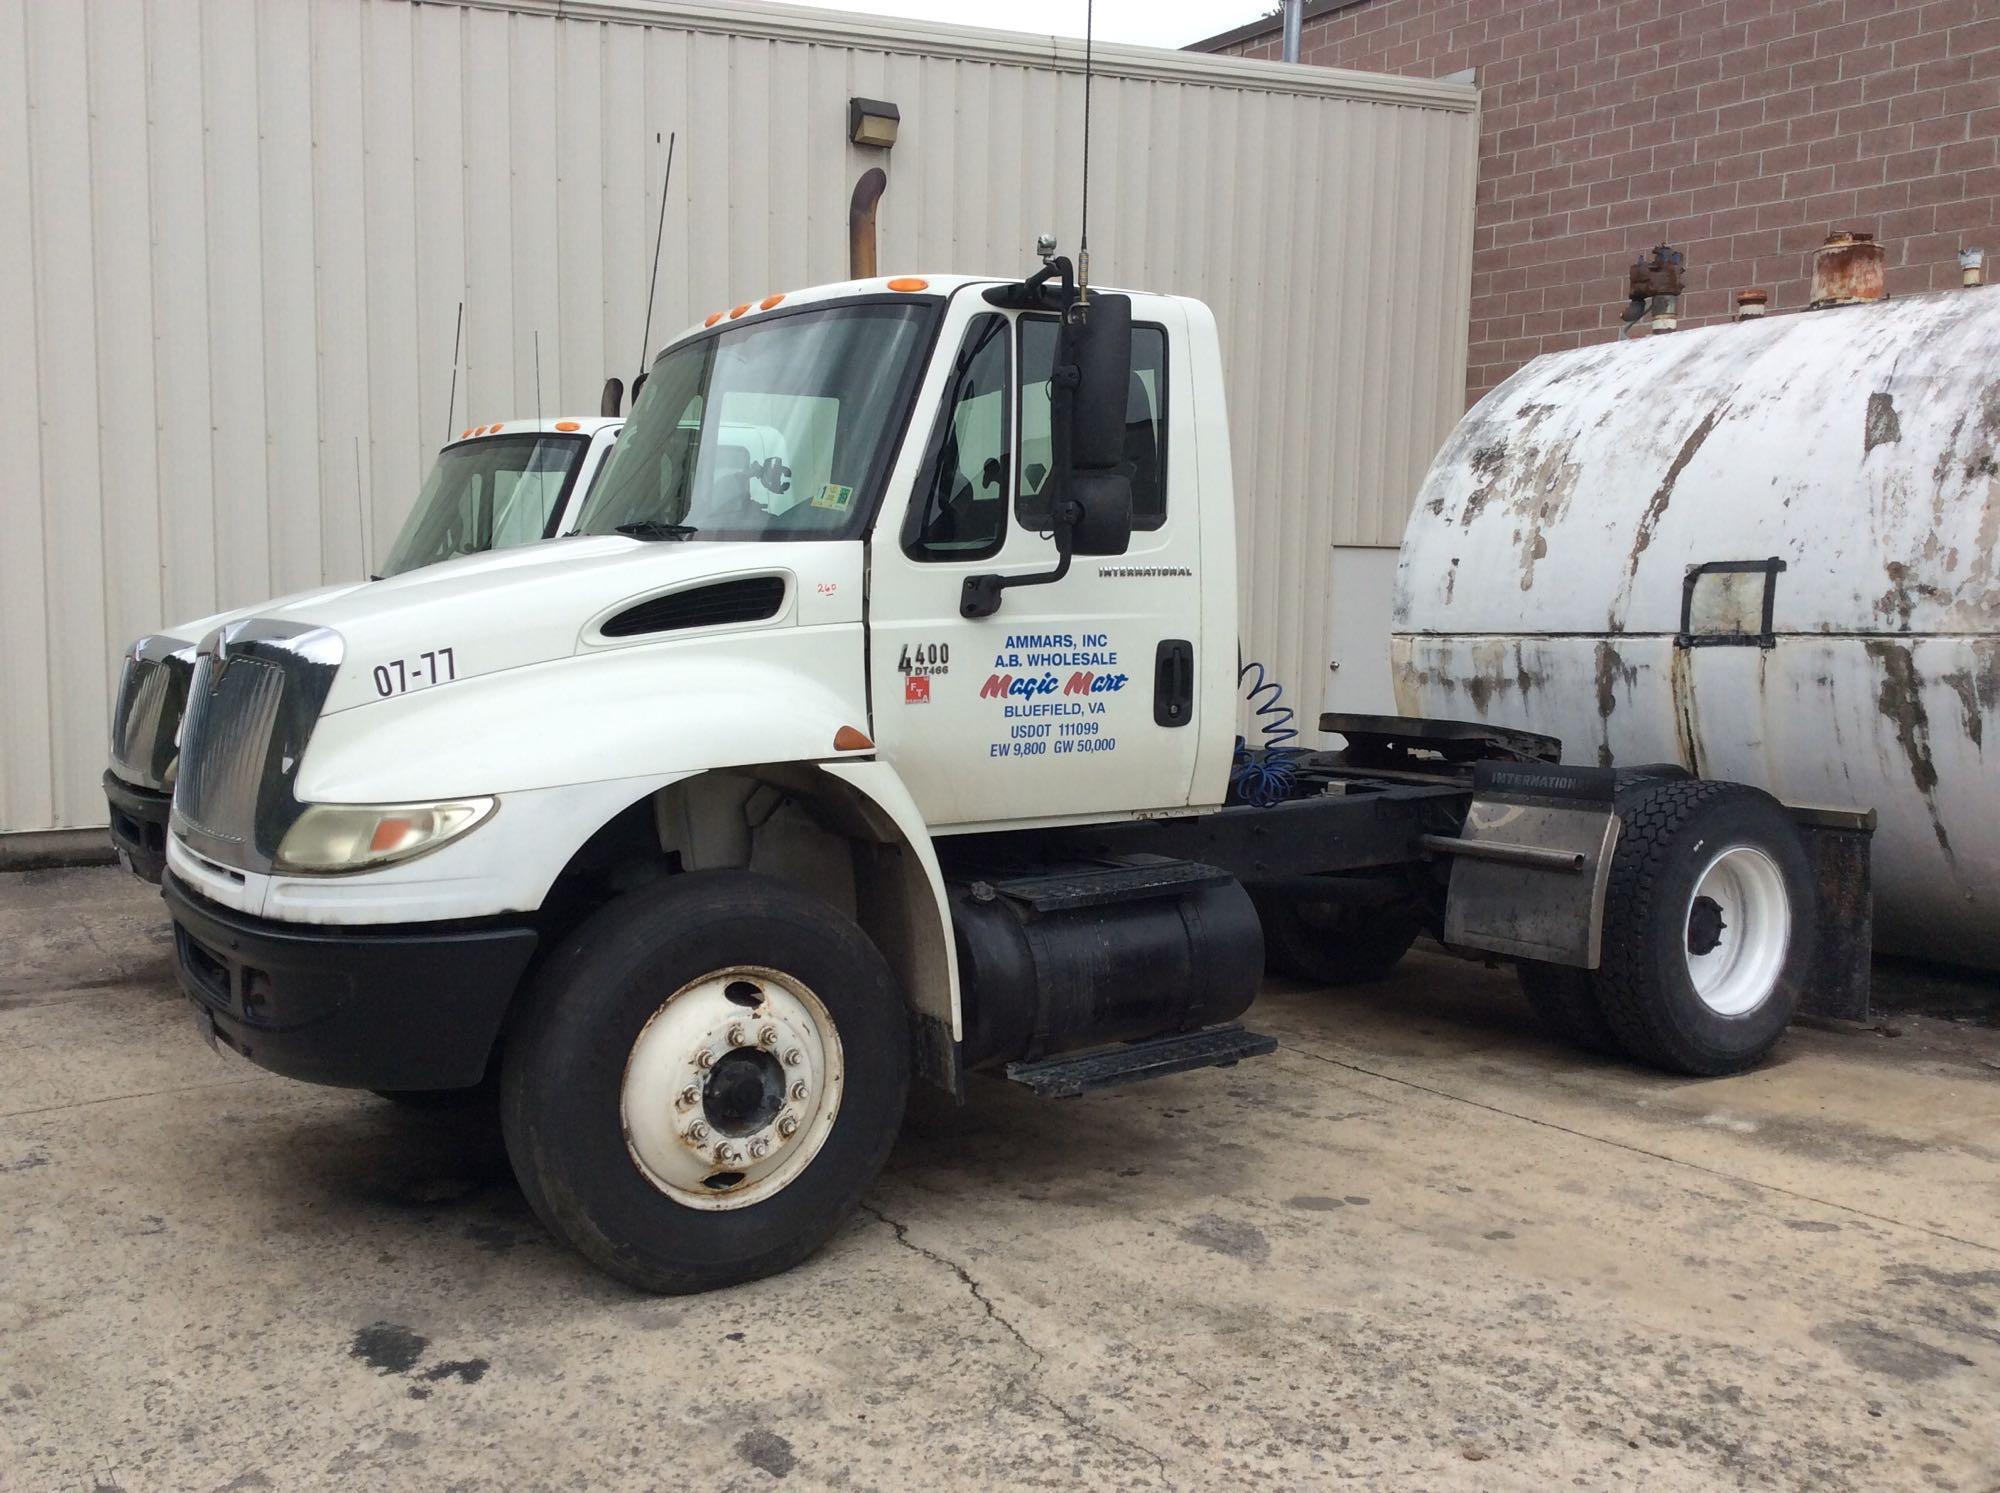 Tractors, Trailers, Box Trucks, Warehouse & Garage Equipment